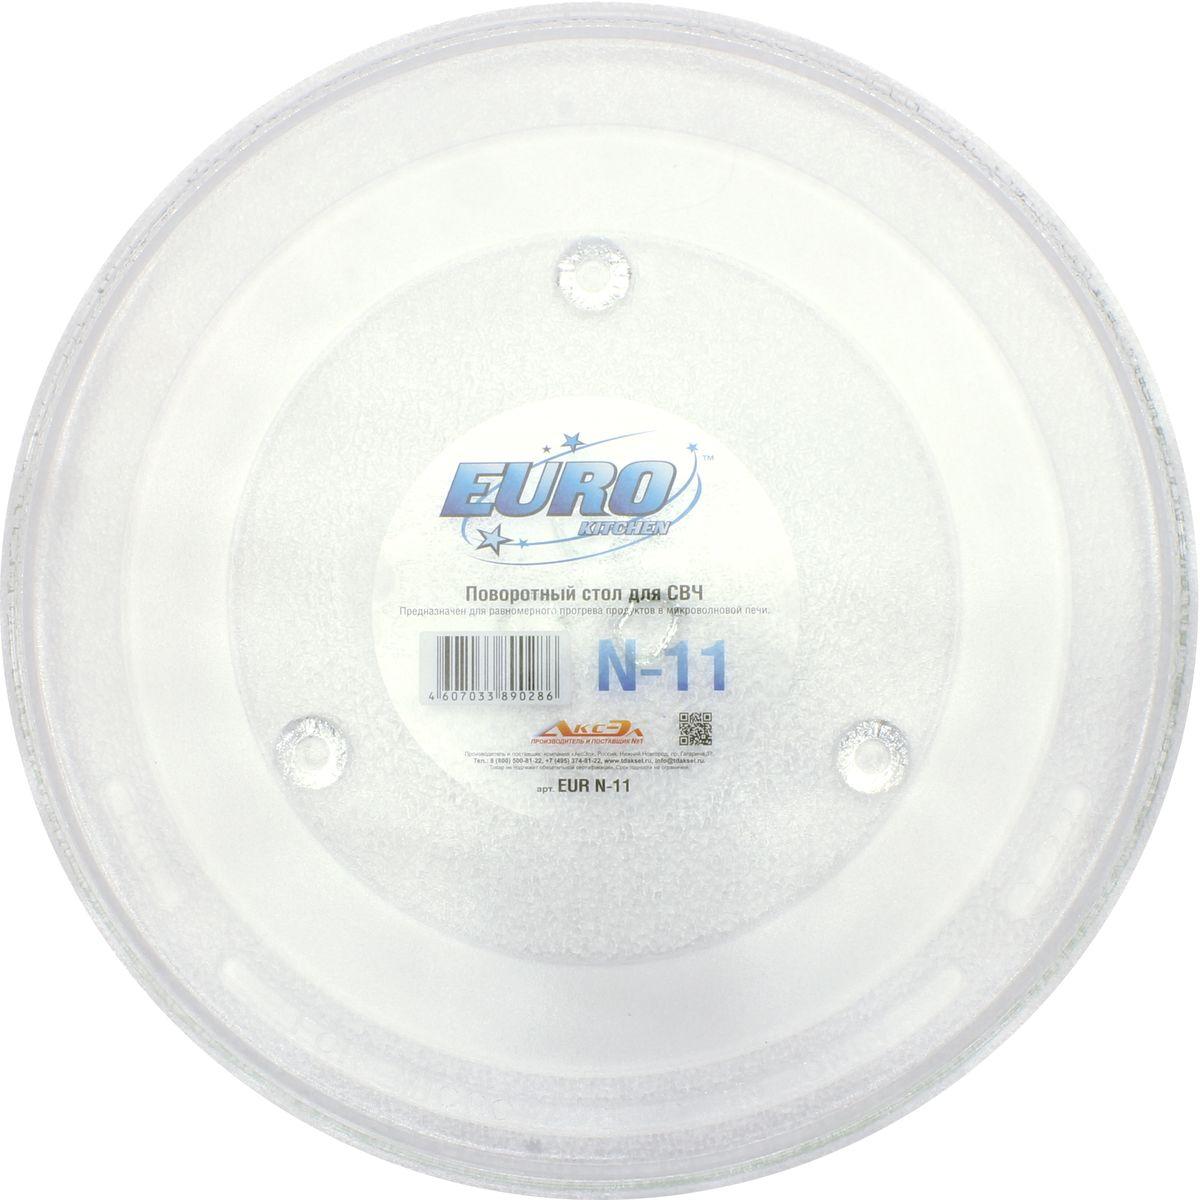 Euro Kitchen N-11 тарелка для СВЧN-11Универсальная тарелка N-11 для микроволновой печи с куплером. Диаметр тарелки 295 мм. Изготовлена из специального жаропрочного стекла. Предназначена для равномерного разогрева продуктов в микроволновой печи. Подходит для брендов: Aeg, Airhot, Amica, Ardo, Ariston, Asko, Atlanta, Aurora, Ava, Barazza, Bauknecht, Bbk, Beko, Bomann, Bork, Bosch, Brandt, Candy, Cata, Centek, Clatronic, Daewoo, De dietrich, Delfa, Electrolux, Elenberg, Ergo, Erisson, Eurotec, Fagor, Fimar, Foster, Franke, Fulgor, Fusion, Gaggenau, Gastrorag, Goldstar, Gorenje, Hankel, Hansa, Hilton, Horizont, Hurakan, Hyundai, Ilve, Indesit, Kaiser, Kenmore, Kenwood, Korting, Kuppersberg, Kuppersbusch, Kamark, Keran, Lg, Liberton, Liberty, Maxwell, Menumaster, Midea, Miele, Moulinex, Mystery, Neff, Oursson, Panasonic, Proficook, Rainford, Redmond, Rolsen, Samsung, Saturn, Scarlett, Sencor, Sharp, Siemens, Simfer, Sinbo, Sirman, Smeg, Supra, Teka, Thomson, Toshiba, V-zug, Vasko, Vimar, Vitek, Vr, Weissgauff,...